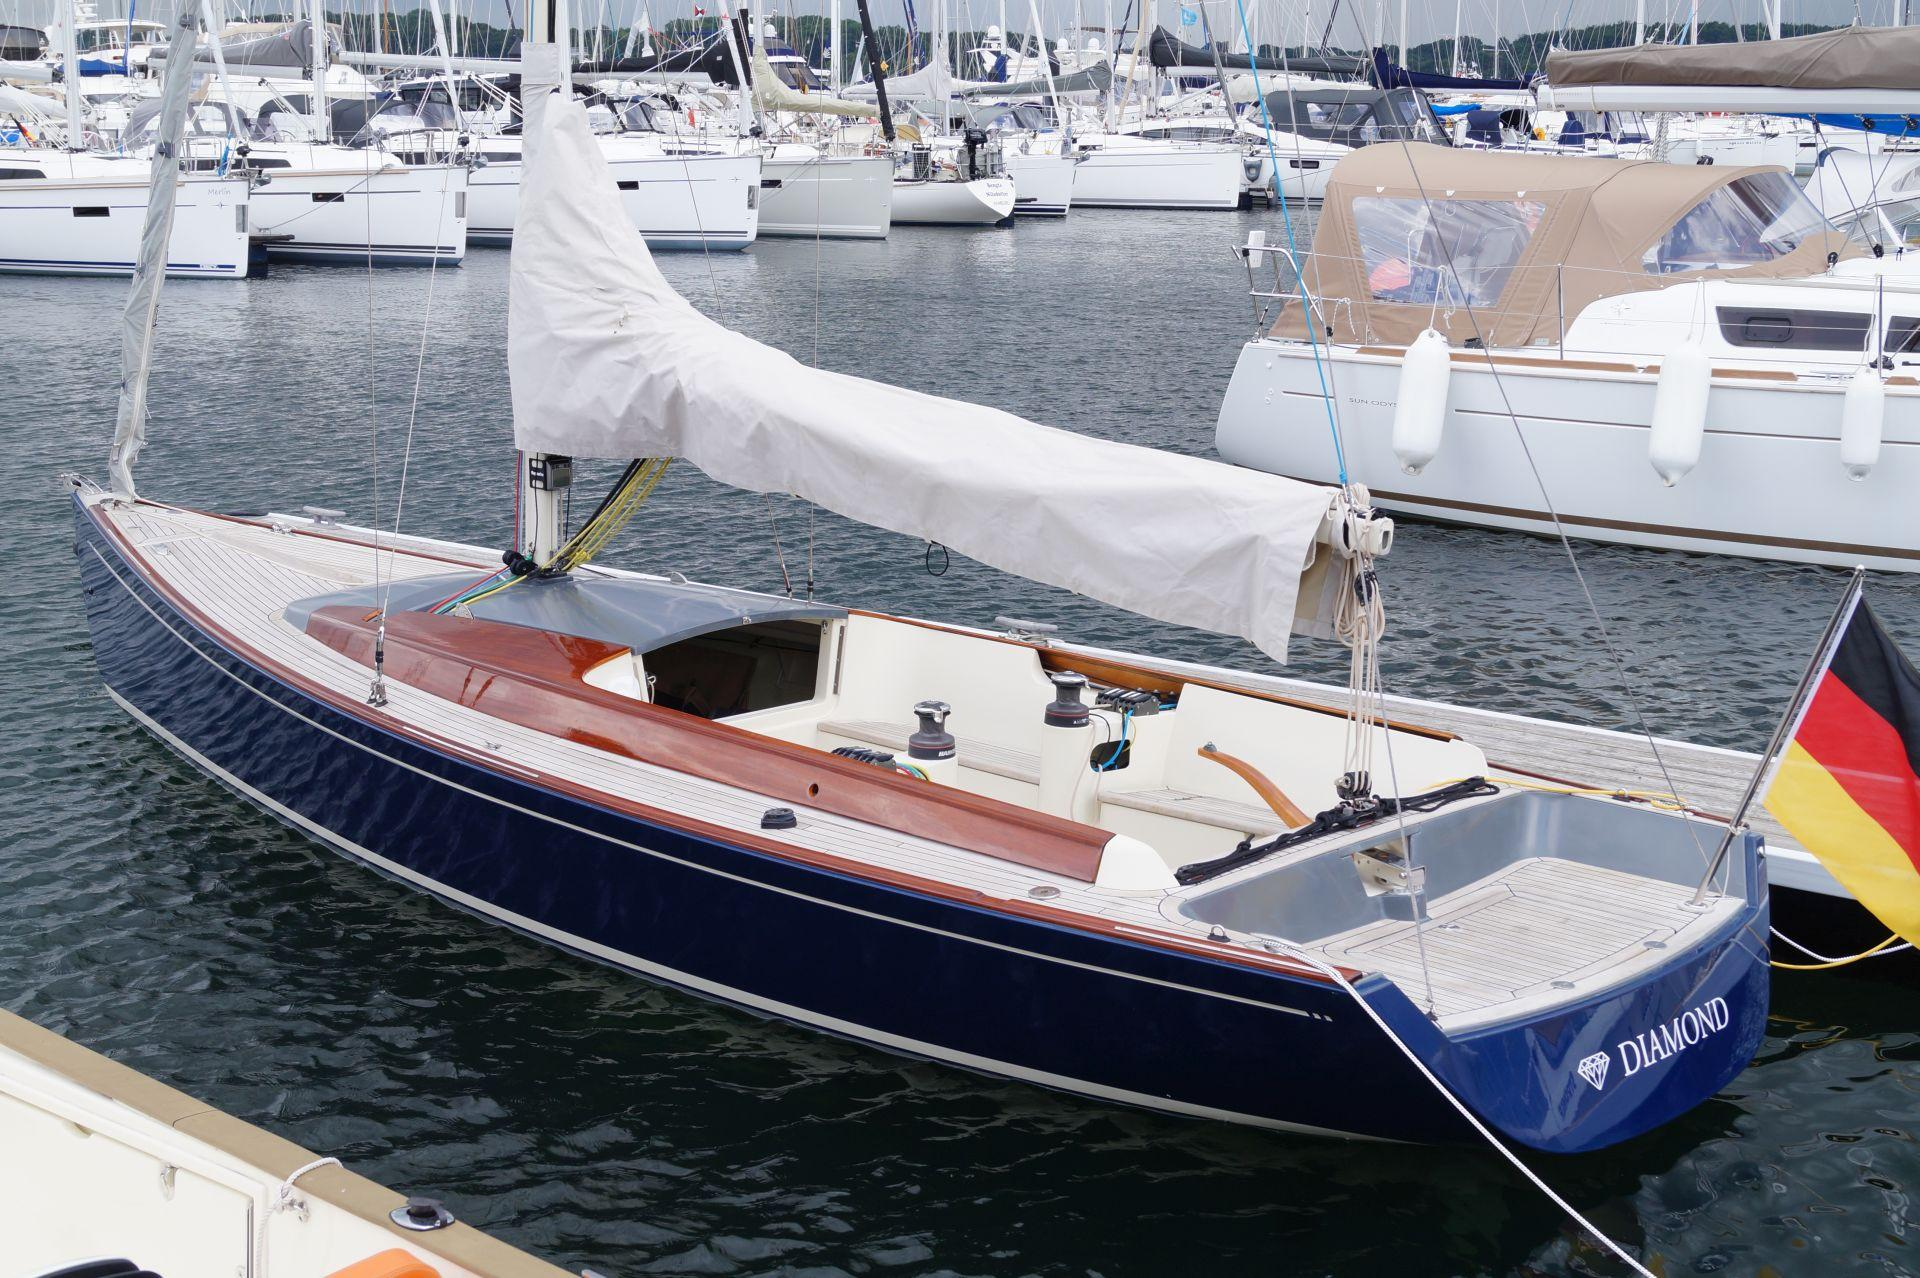 2010 Tofinou 8 0 M Daysailer Sail Boat For Sale Www